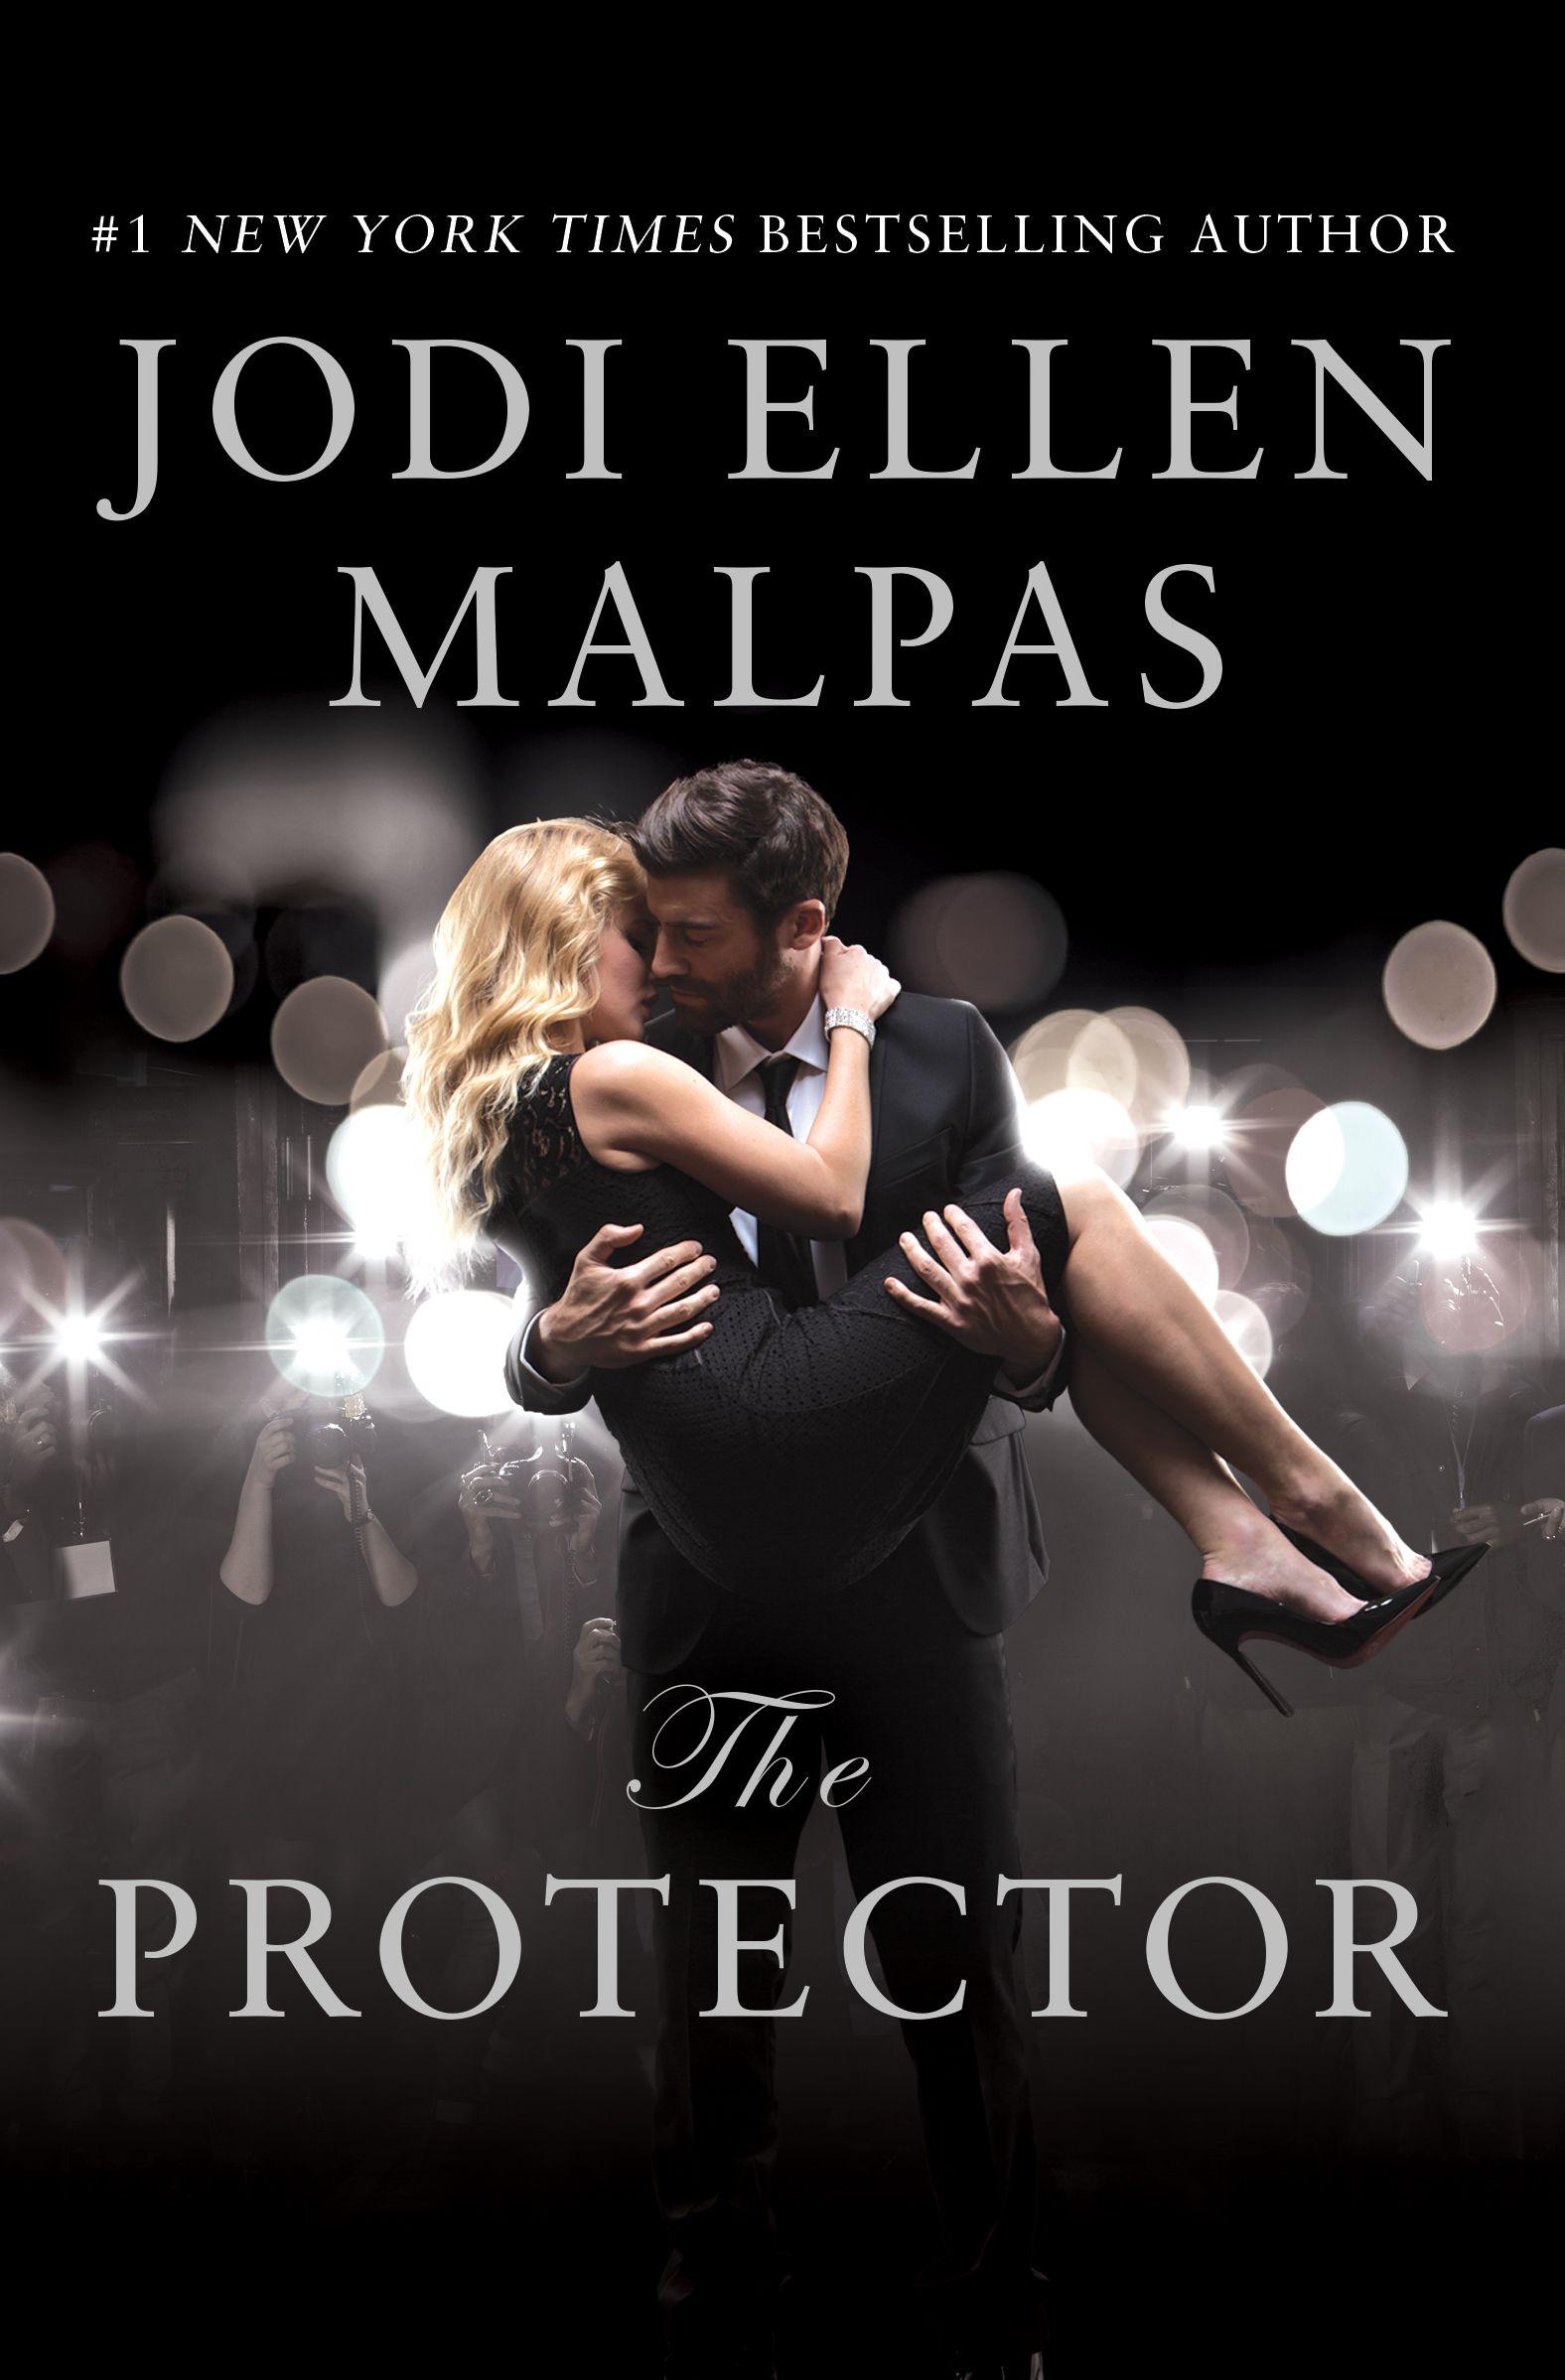 The Protector By Jodi Ellen Malpas (september 6, 2016; Forever Trade  Paperback And